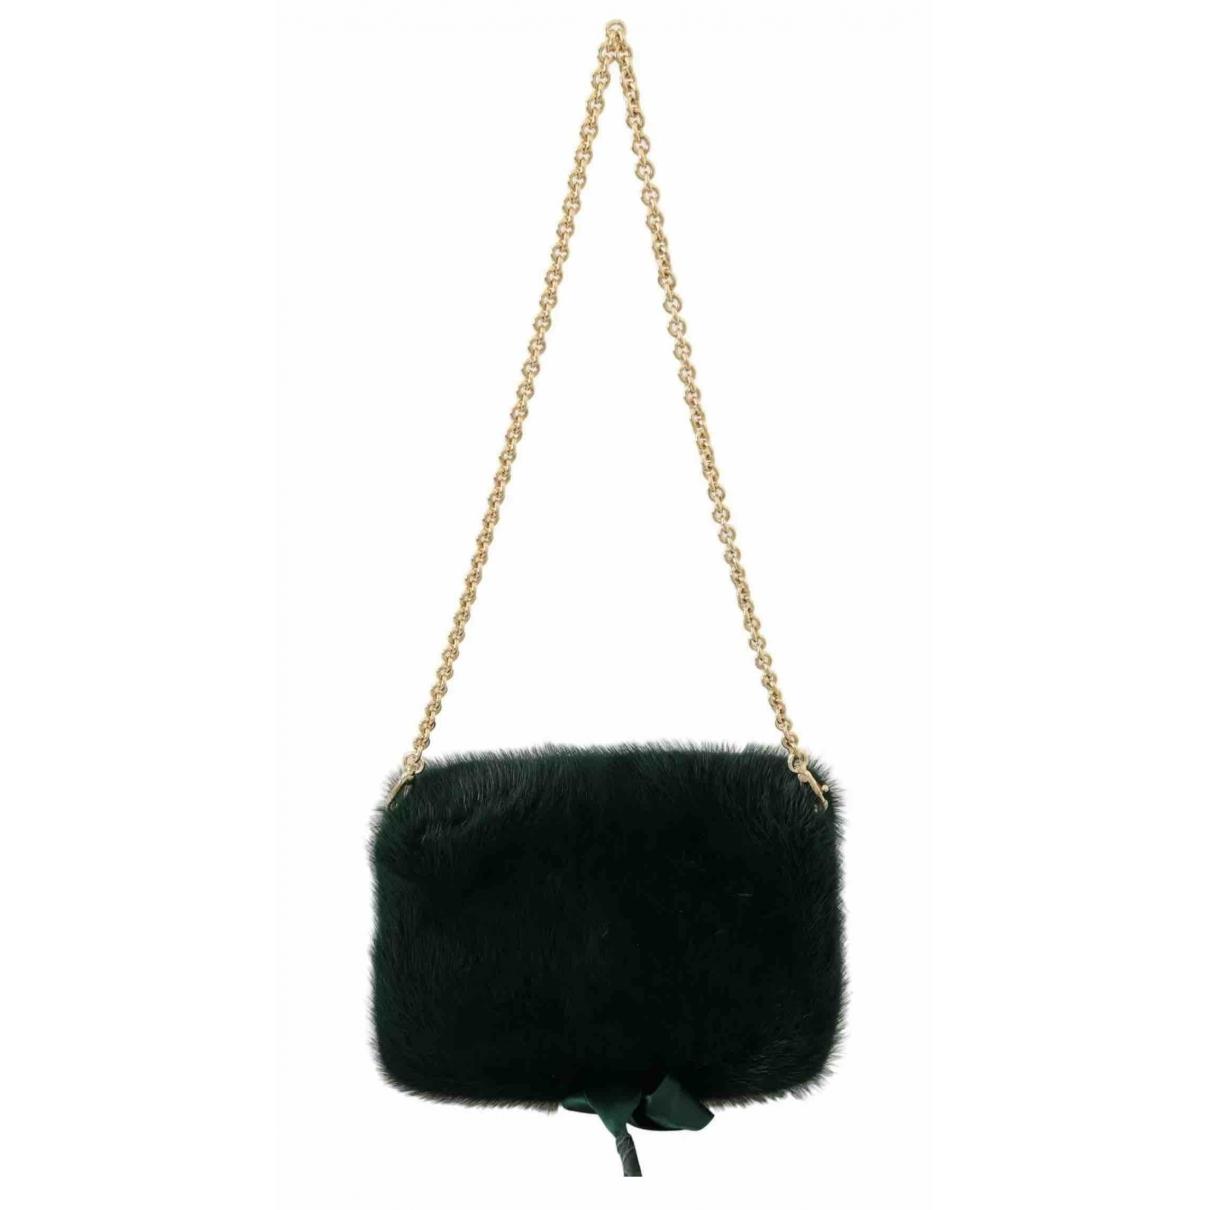 Dolce & Gabbana \N Green Mink Clutch bag for Women \N